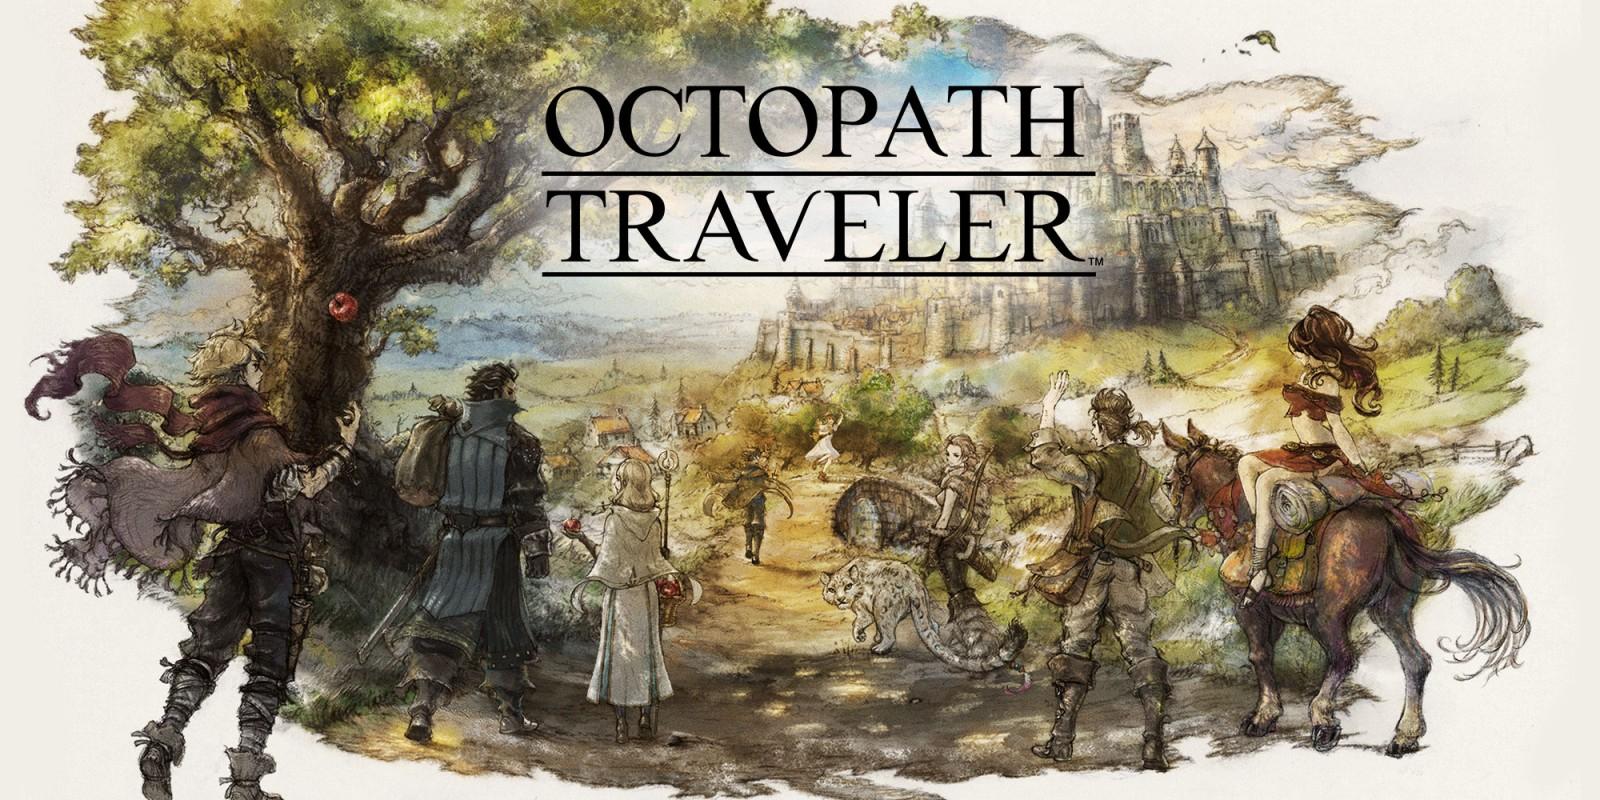 Jeu Octopath Traveler sur Nintendo Switch